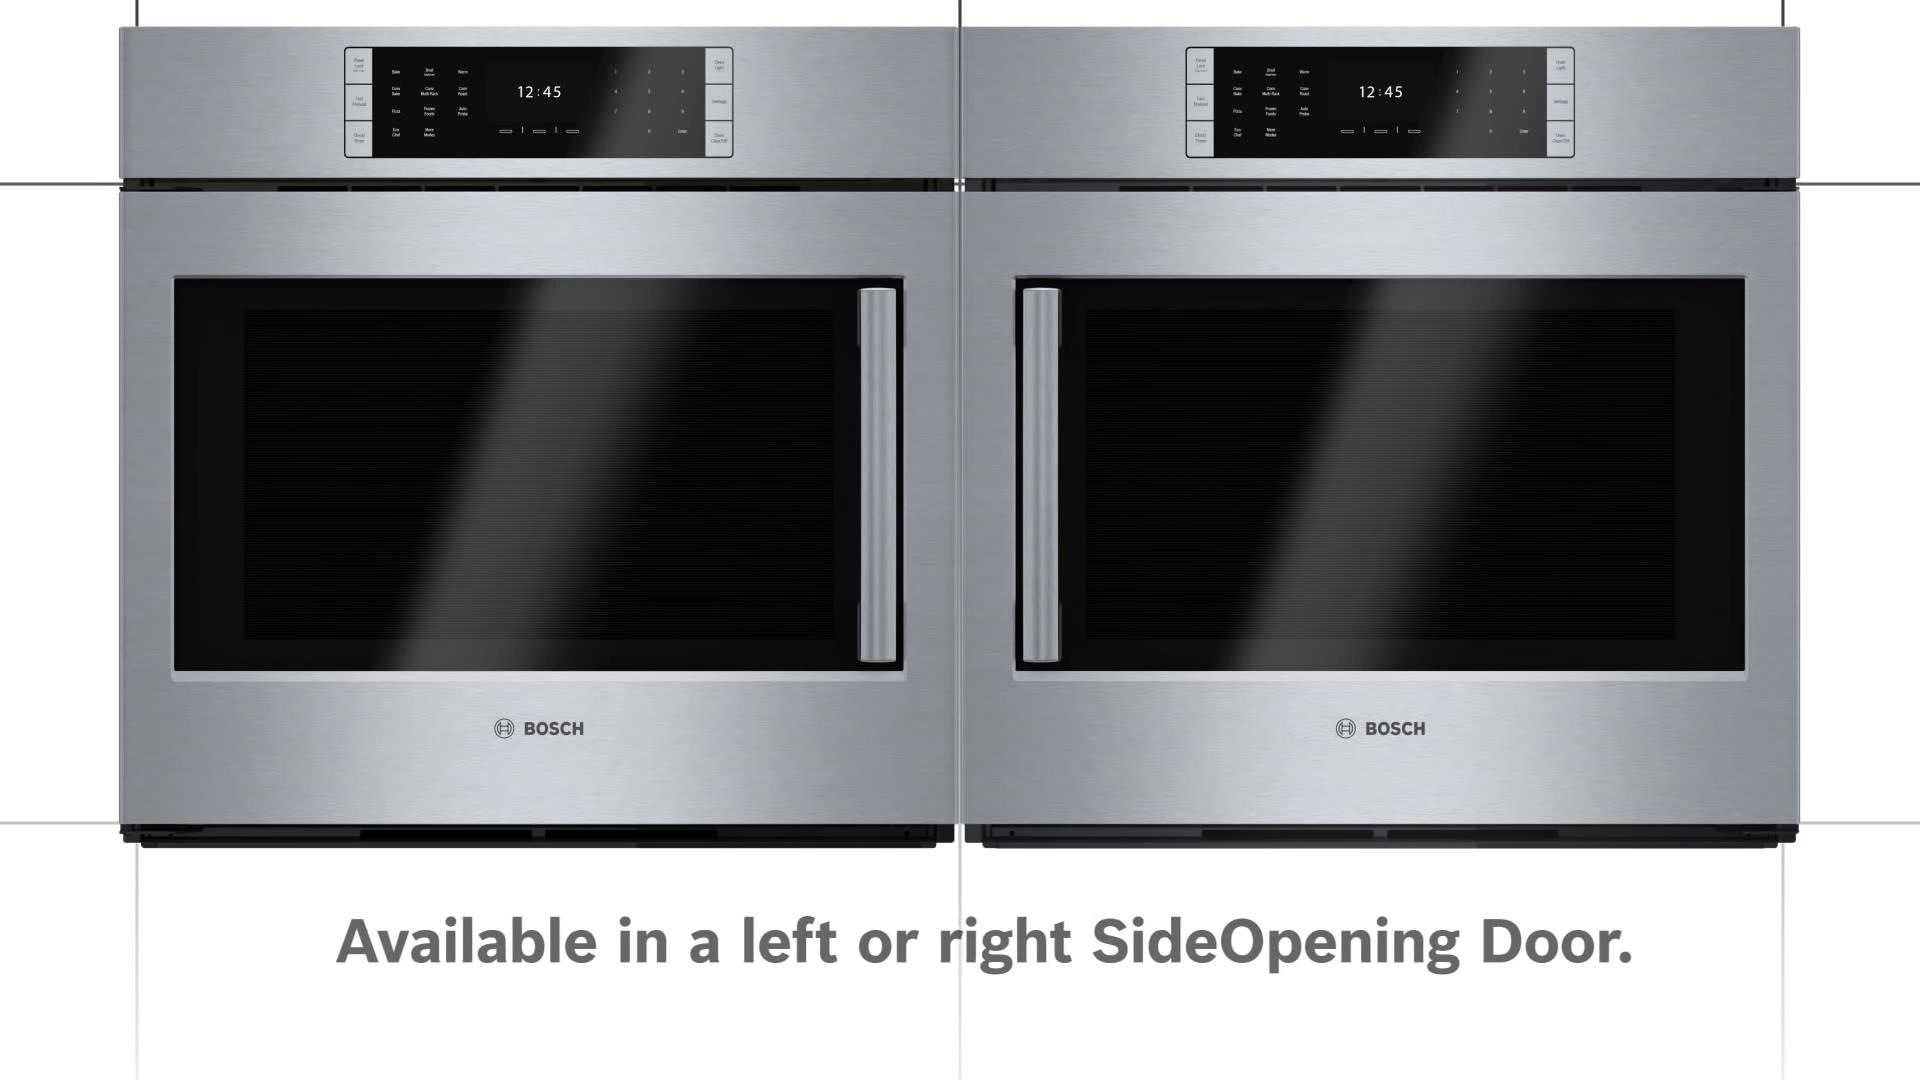 Bosch benchmark flexinduction cooktops kieffer s applianceskieffer s